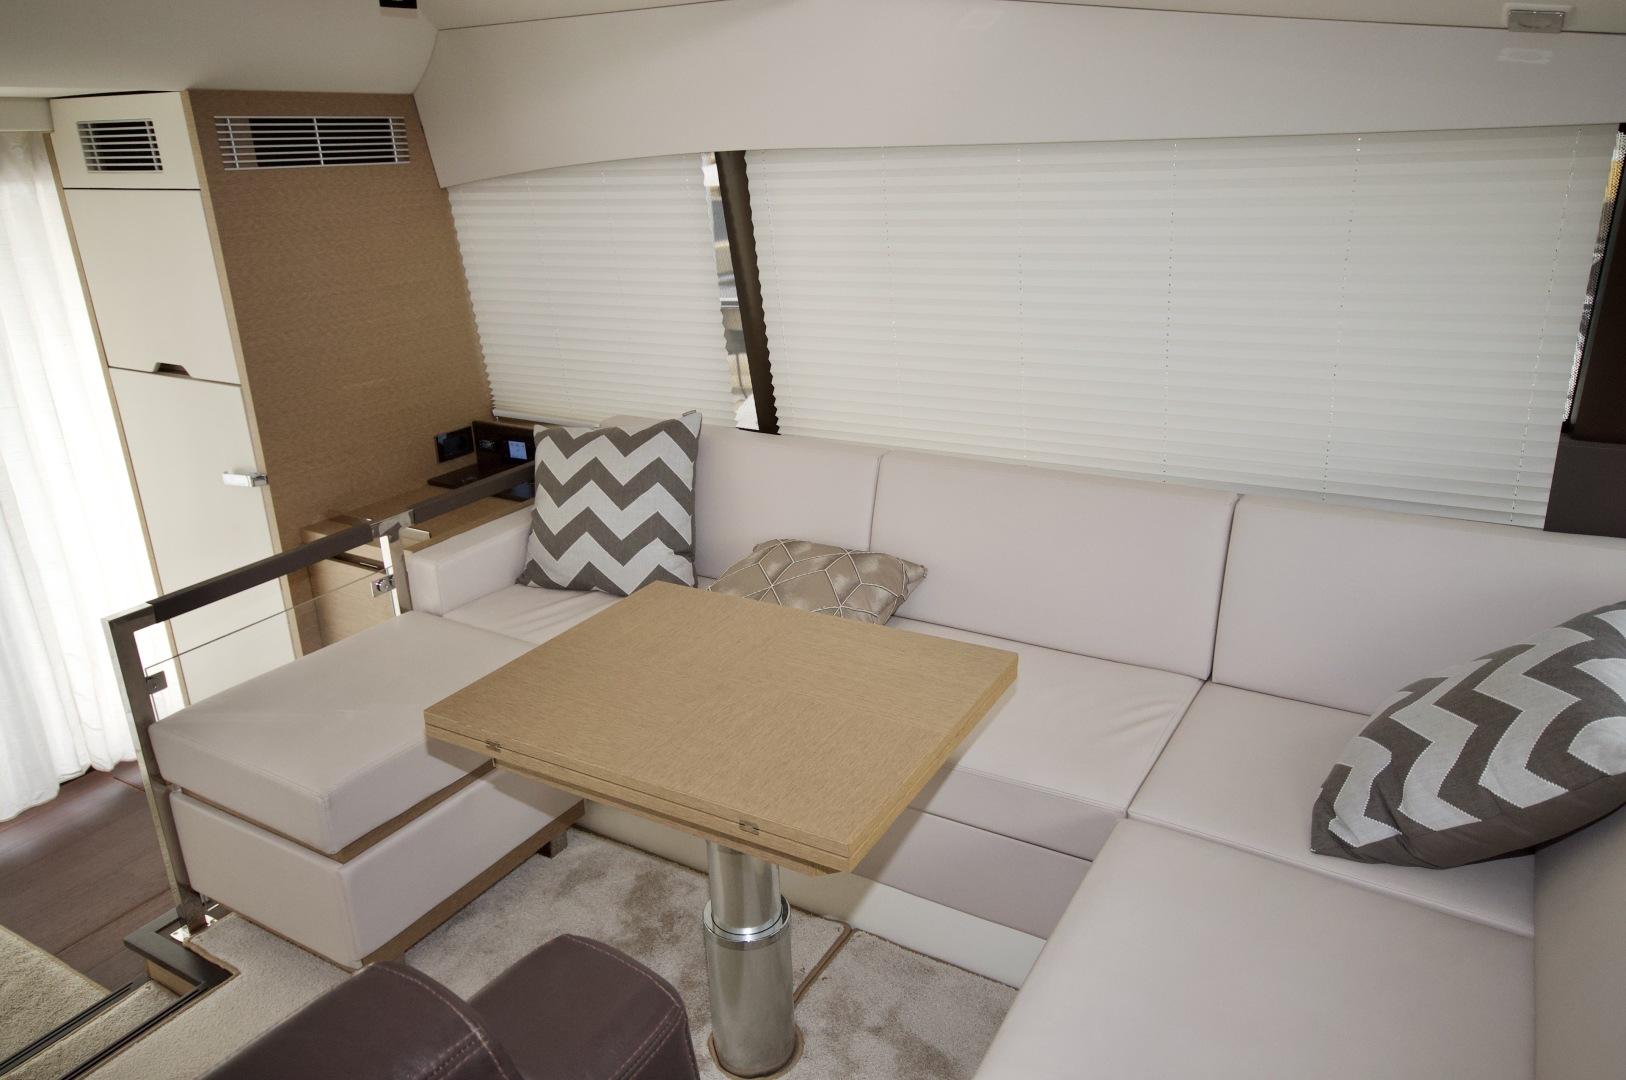 Prestige-460 S 2018-Unforgettable St Petersburg-Florida-United States-2018 Prestige 460 S Yacht  Unforgettable  Dinette-1501561   Thumbnail